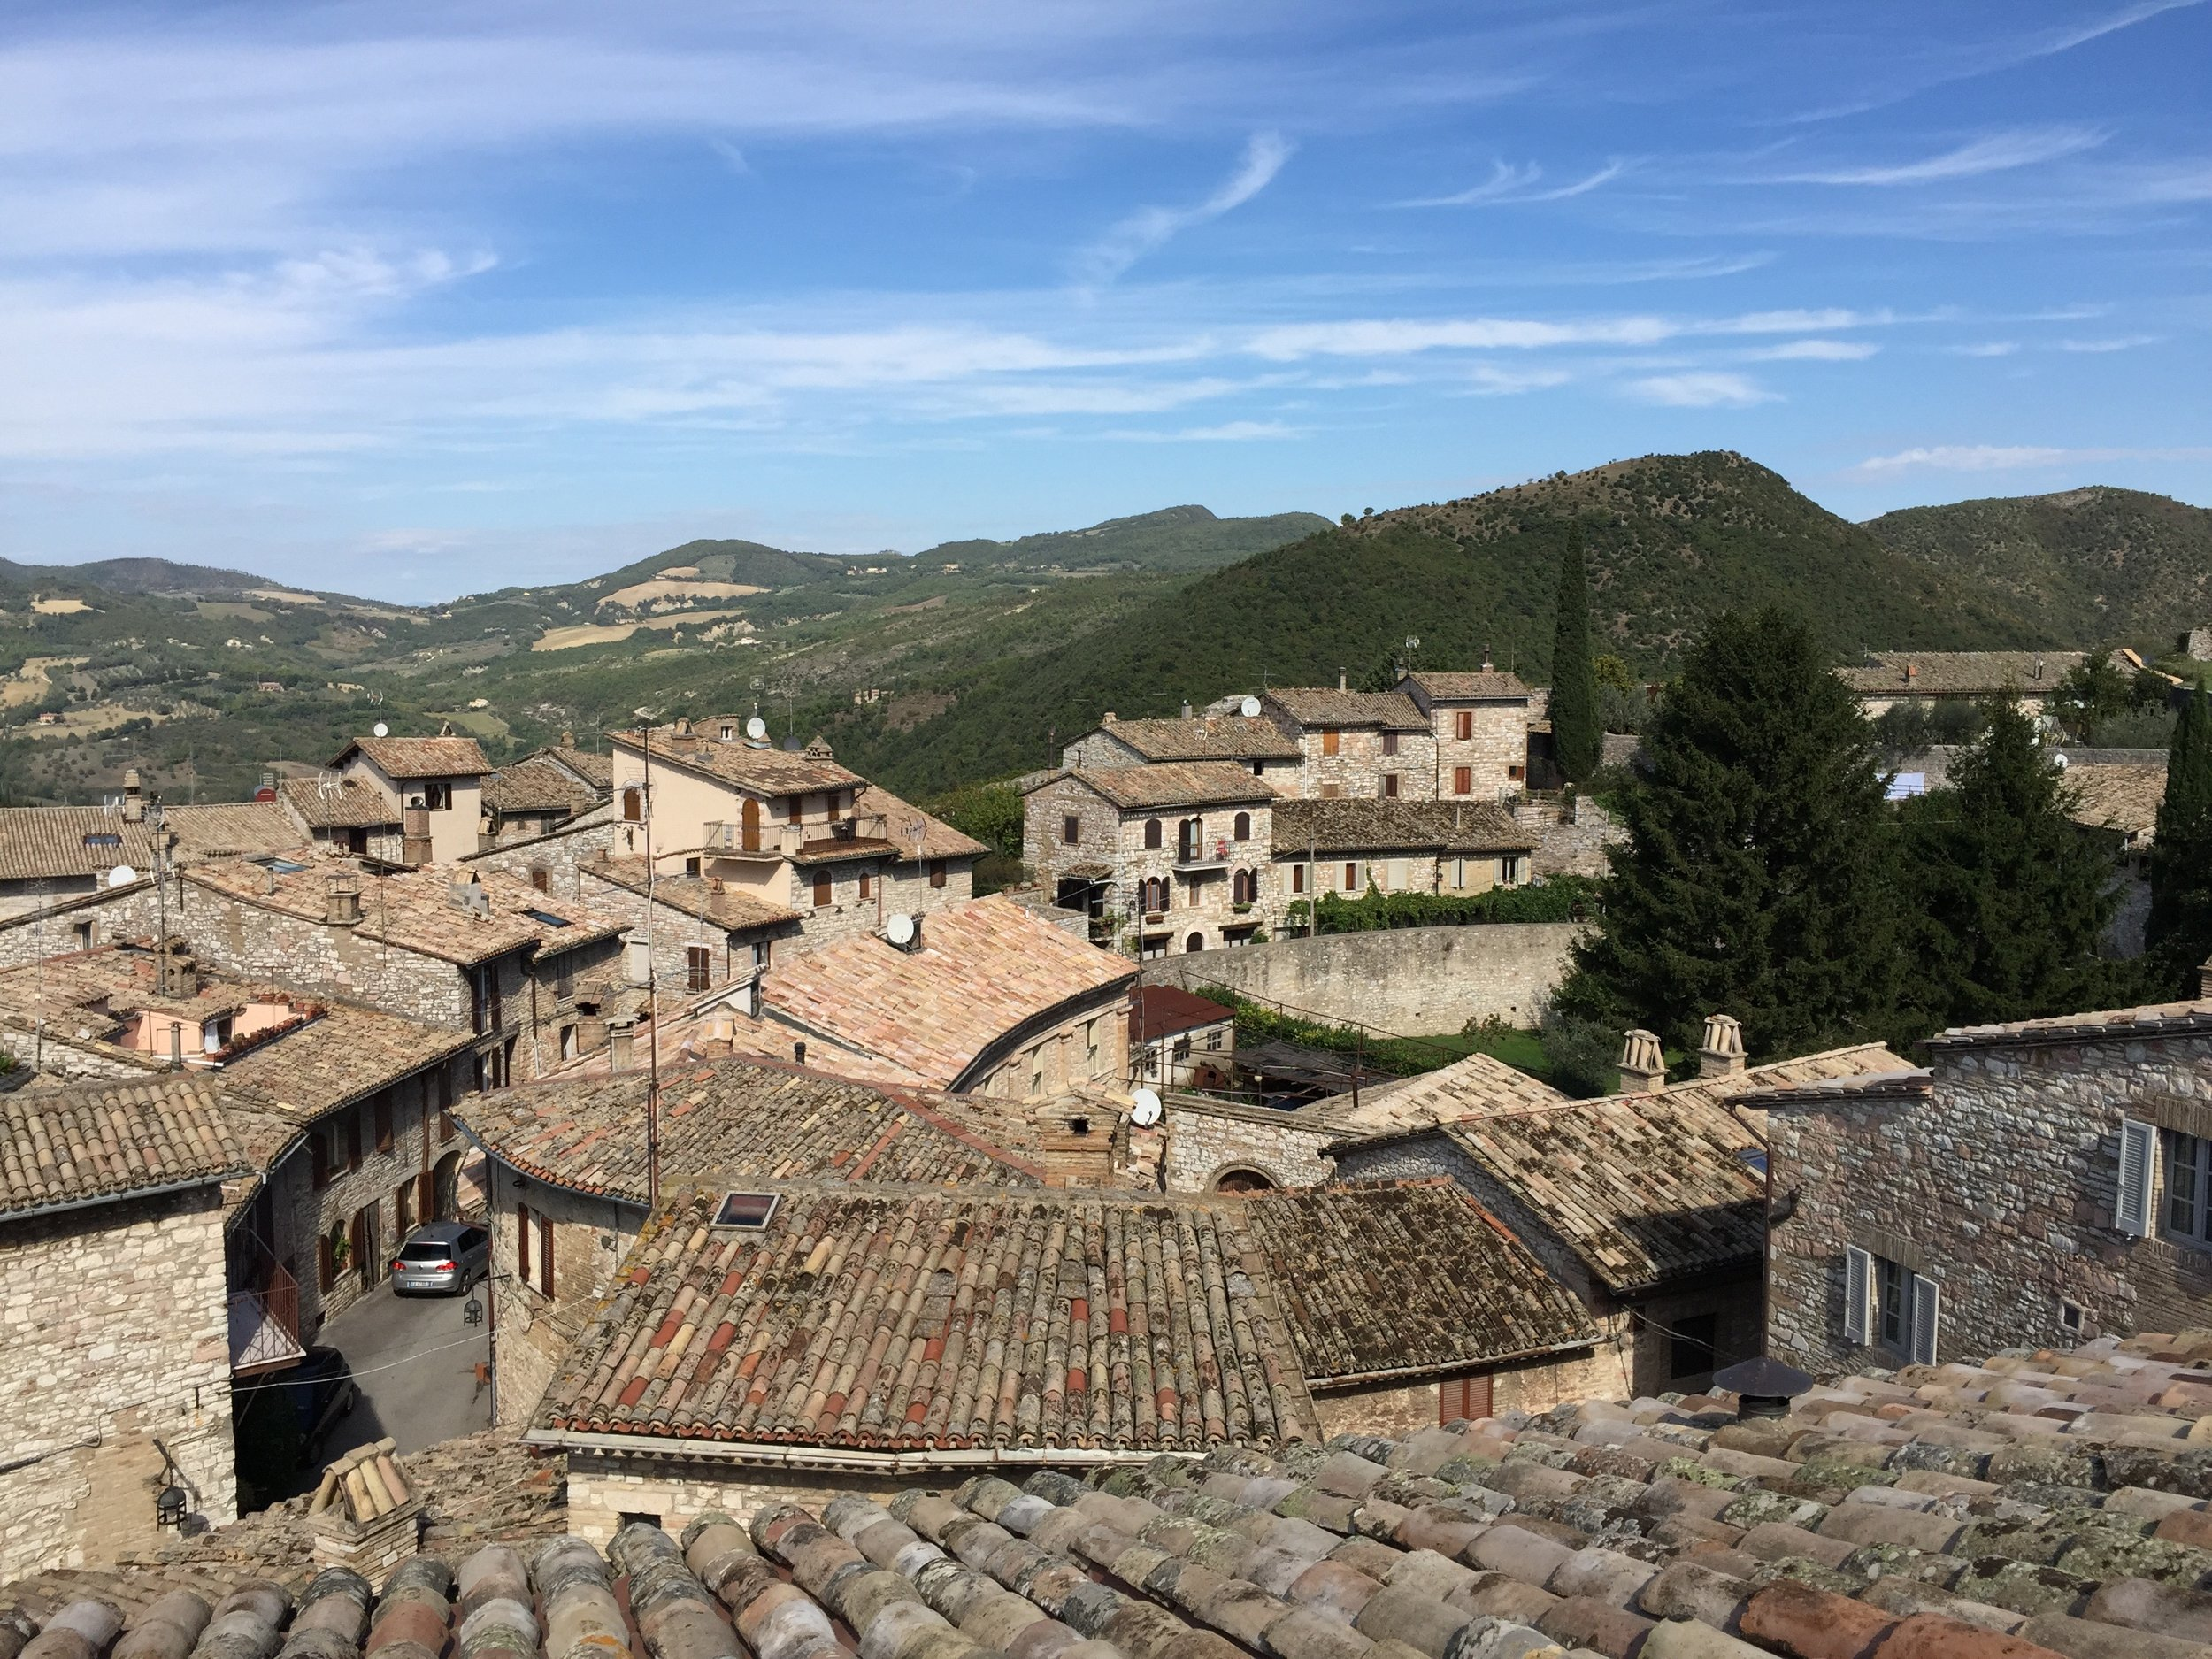 ITA_Assisi_RoofsfromNUN.jpg